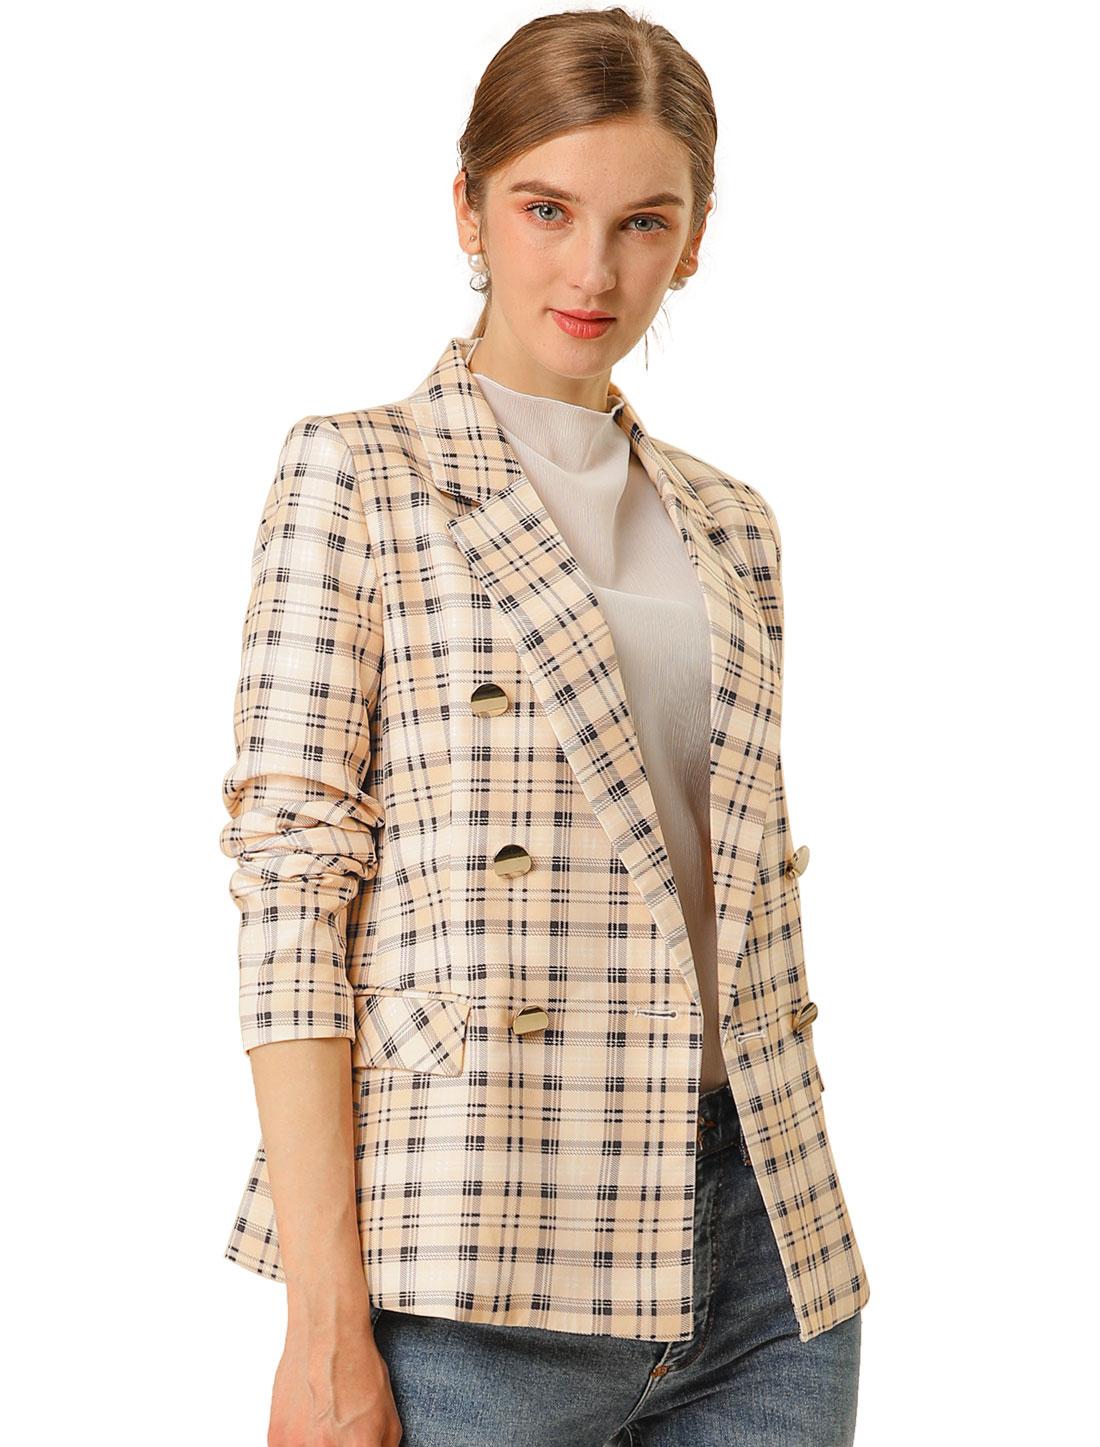 Allegra K Women Plaid Checks Outwear Blazer Jacket Pink Apricot S